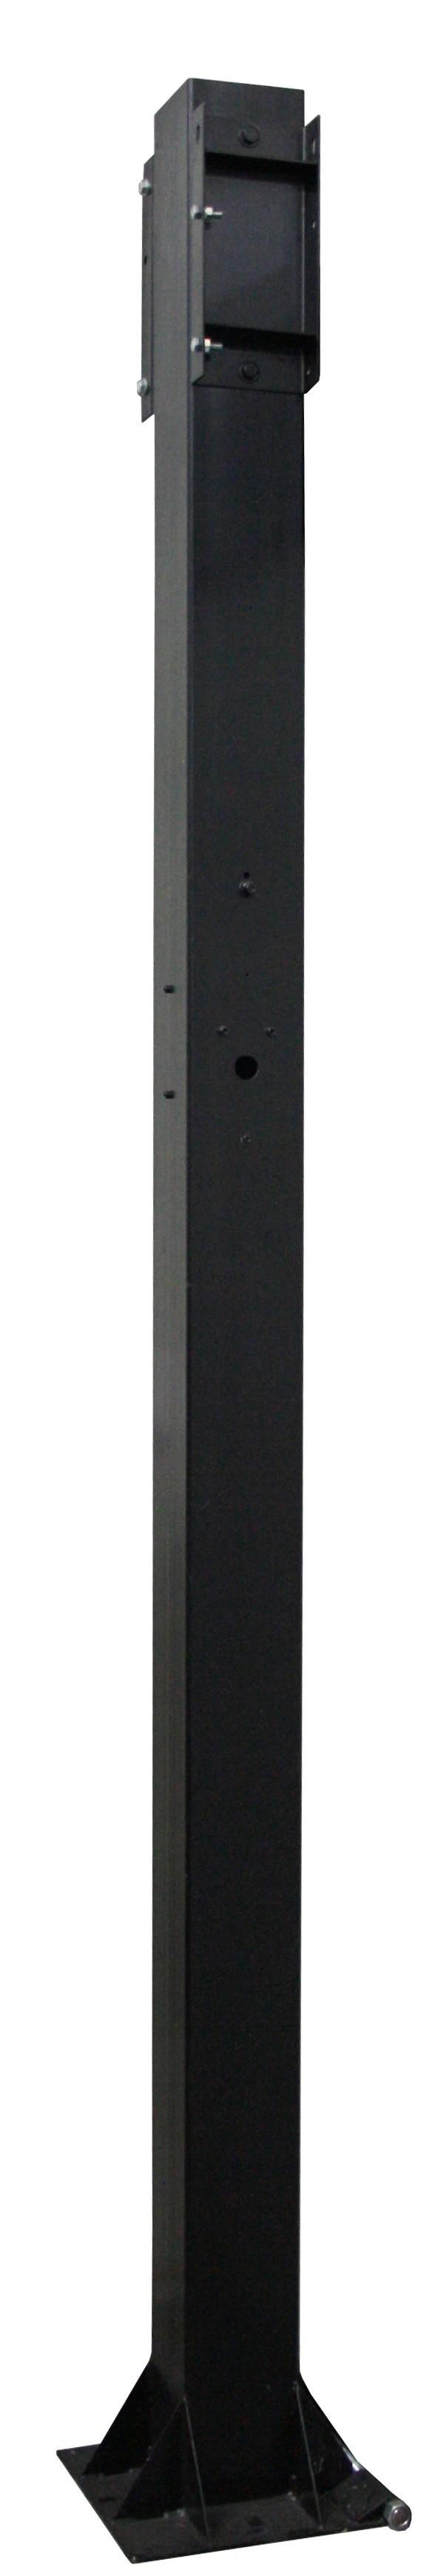 marolotest poteau m tallique hauteur 3 m. Black Bedroom Furniture Sets. Home Design Ideas